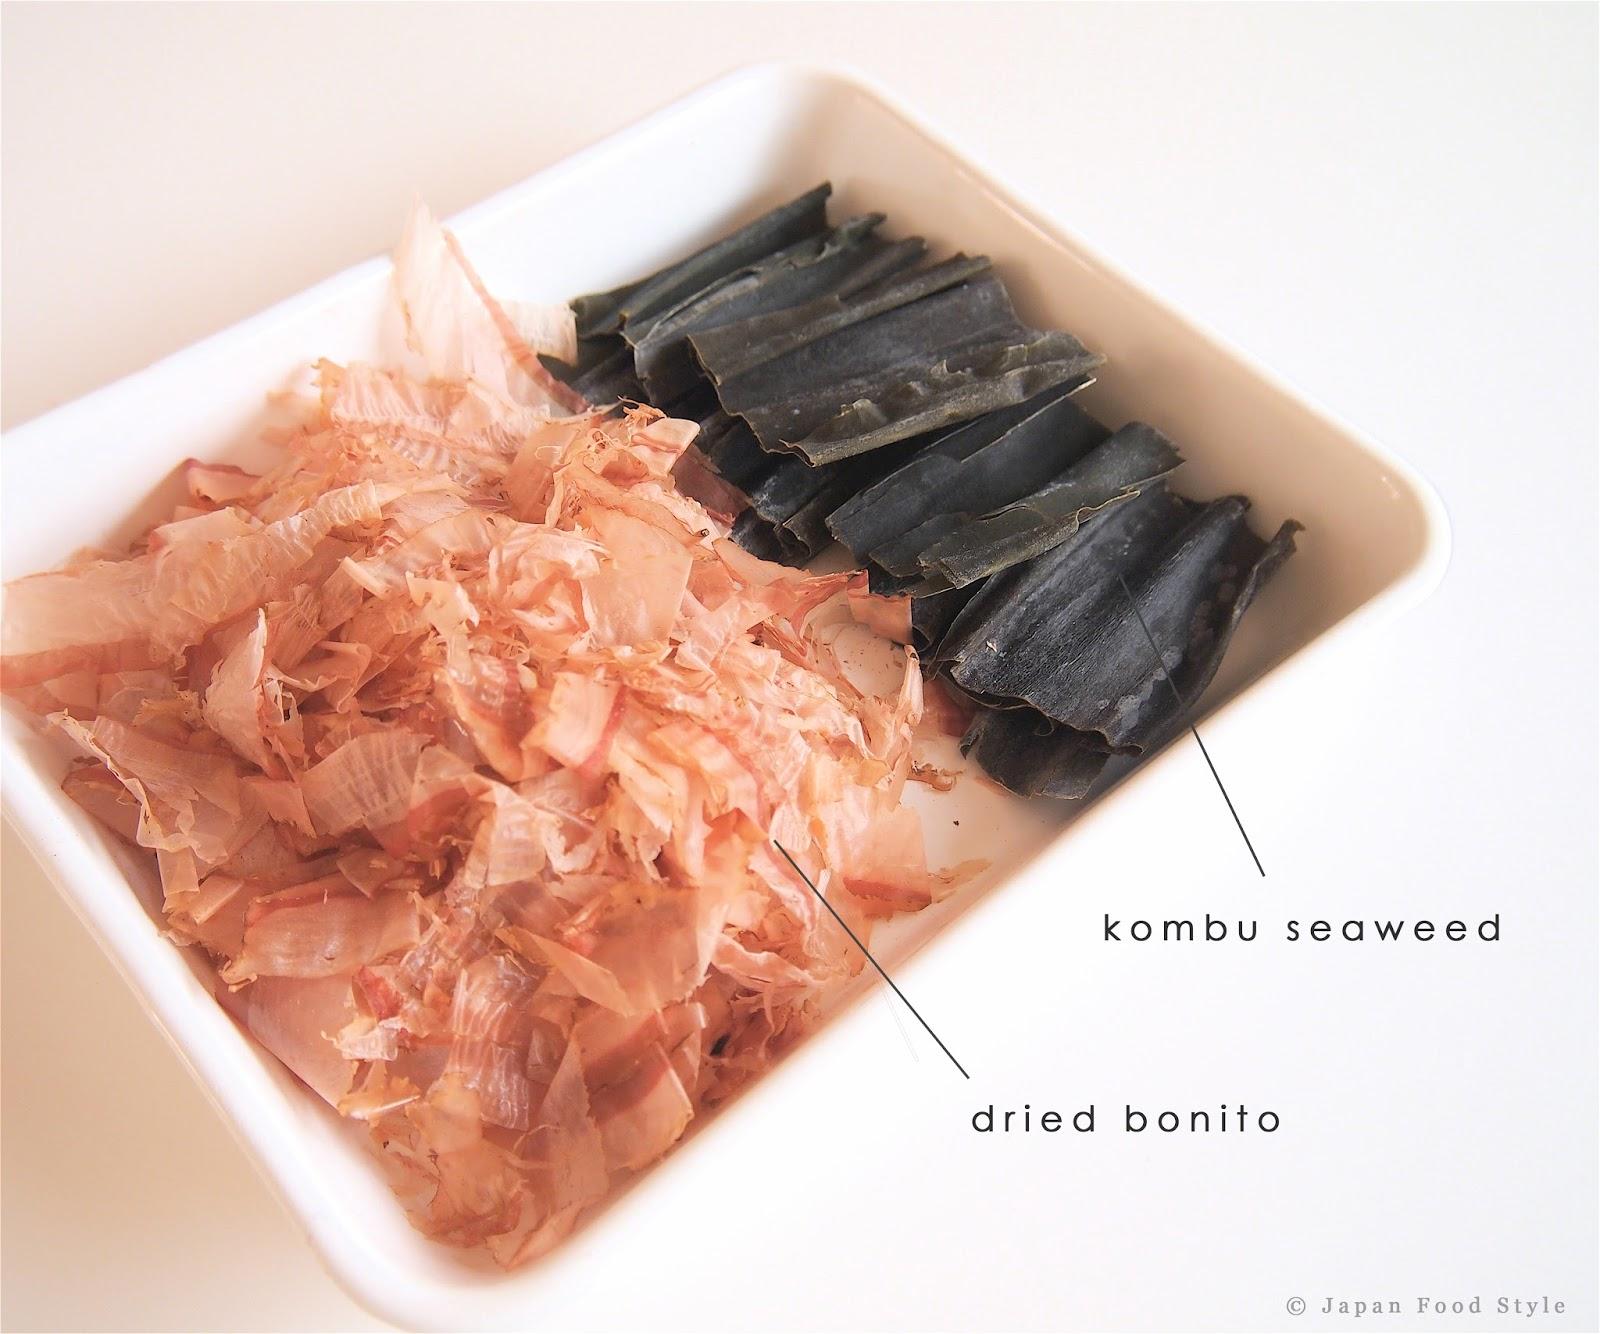 ... ] How to make Dashi stock (Japanese fish broth) | Japan Food Style